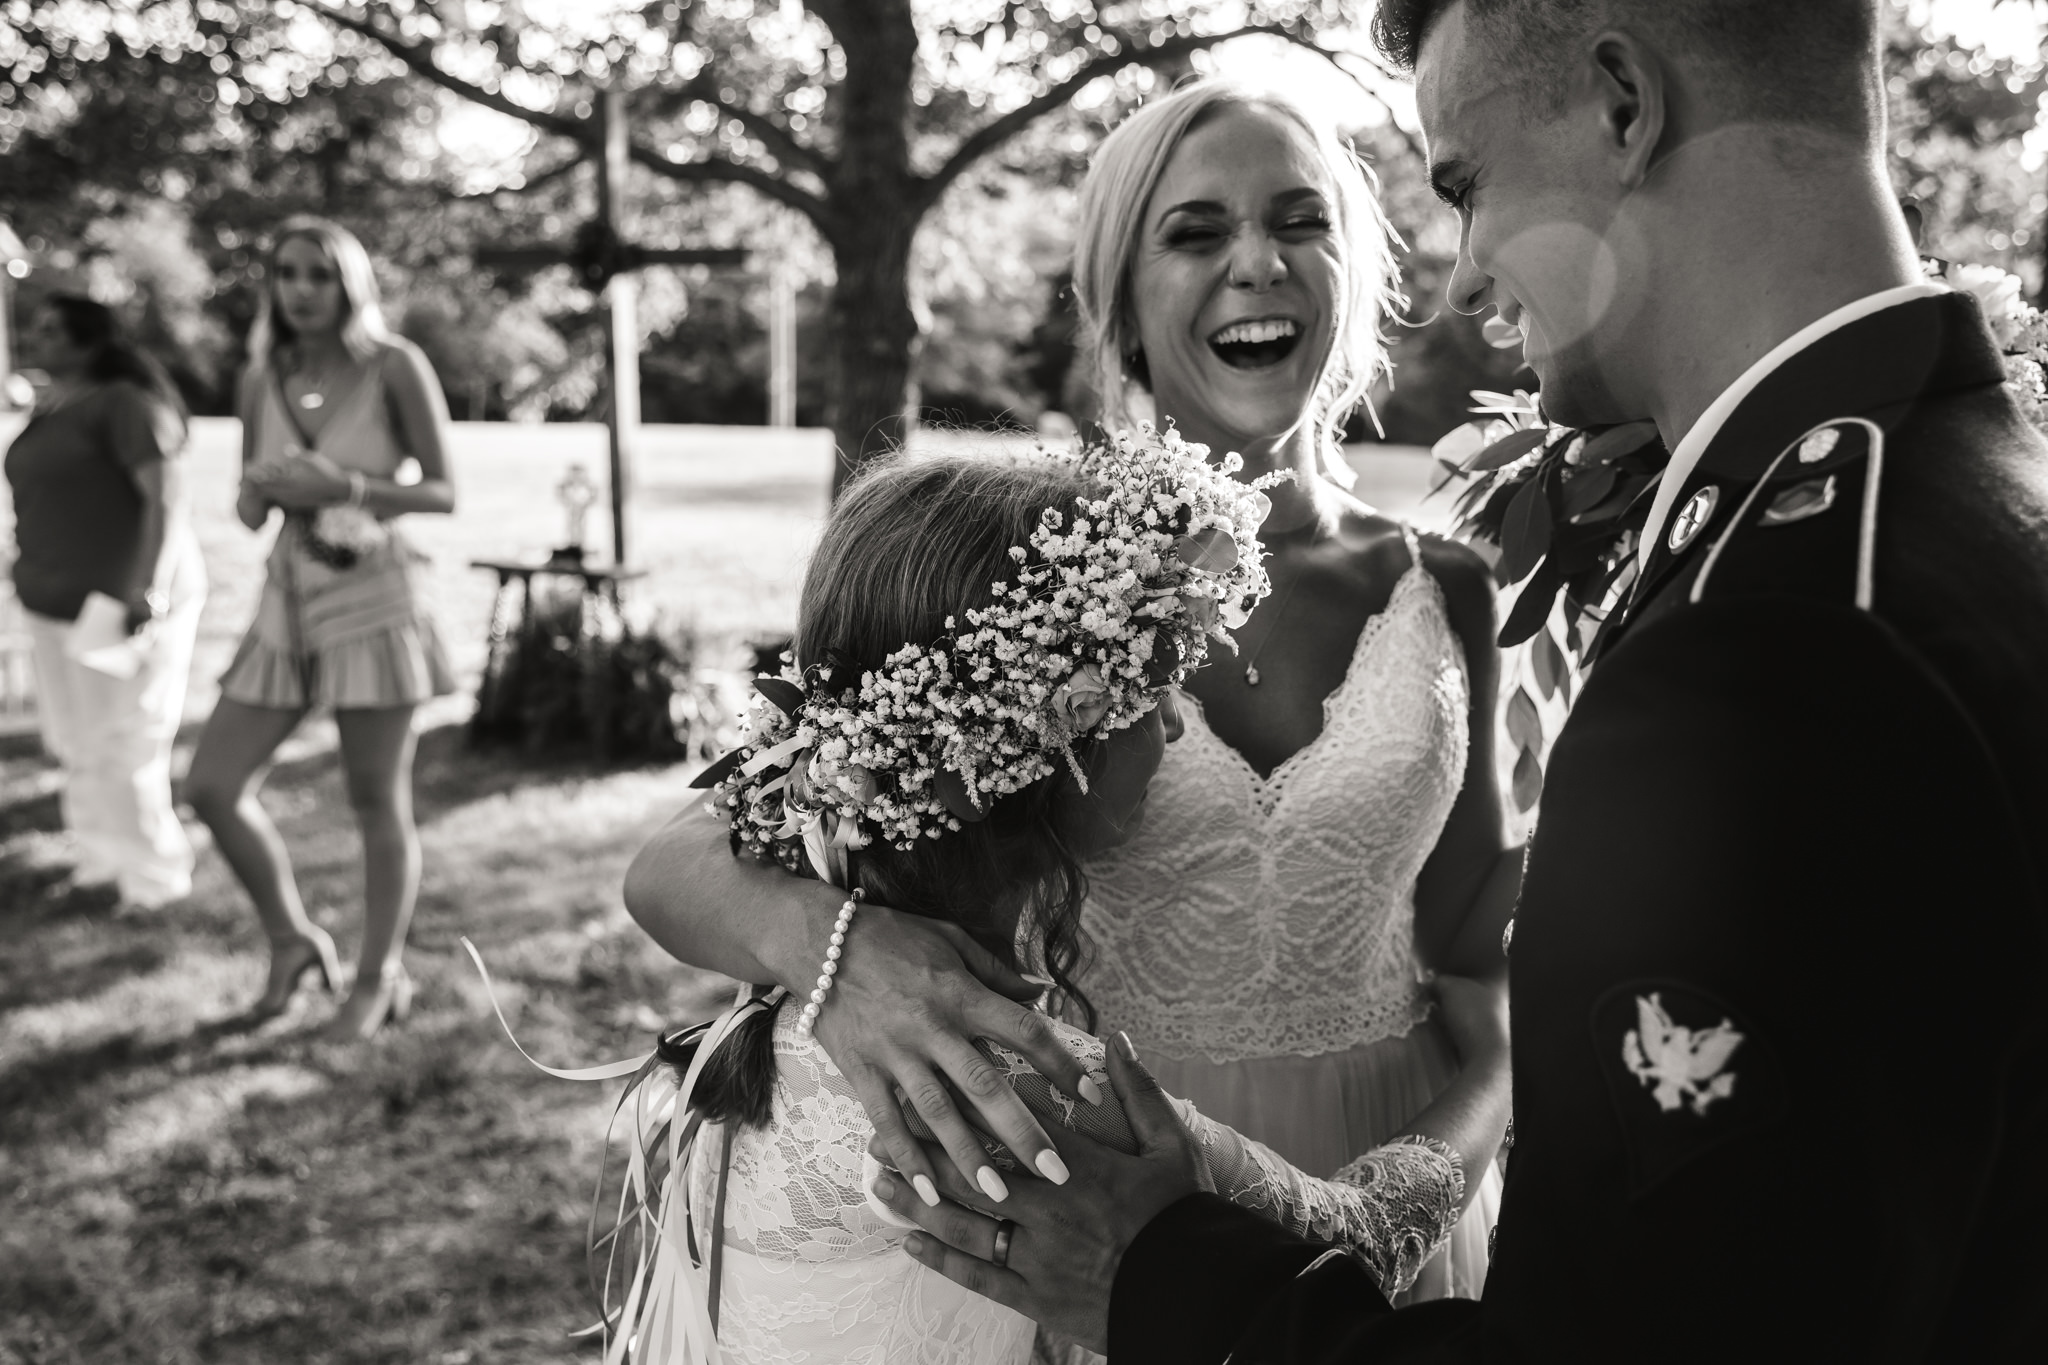 zbackyard-wedding-thewarmtharoundyou-lexy-branson-411.jpg